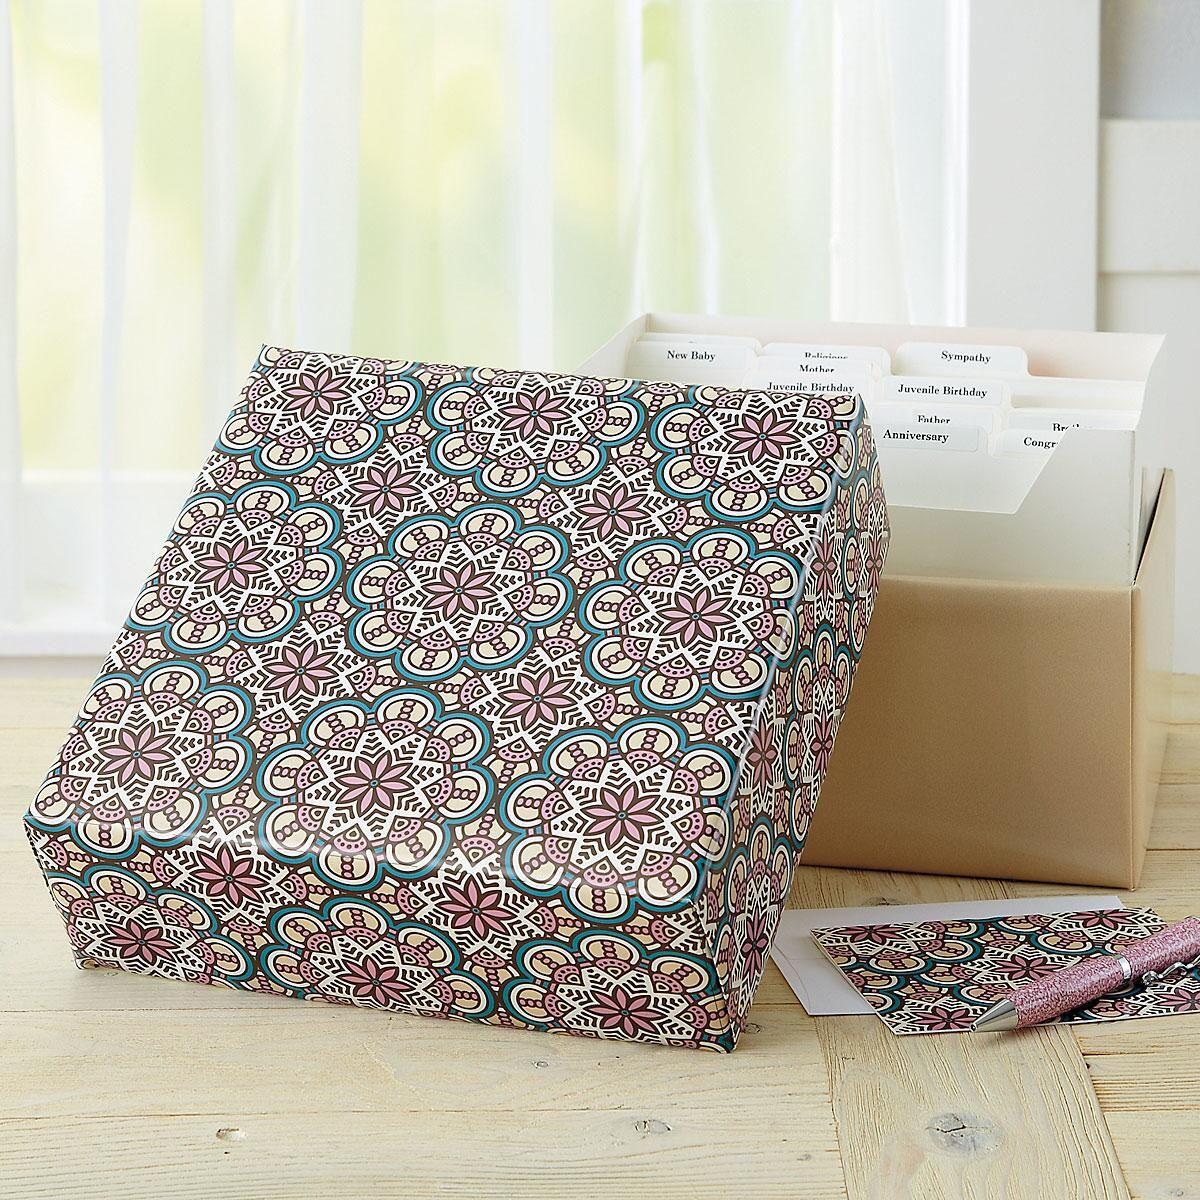 Mosaic Patterns Greeting Card Organizer Box